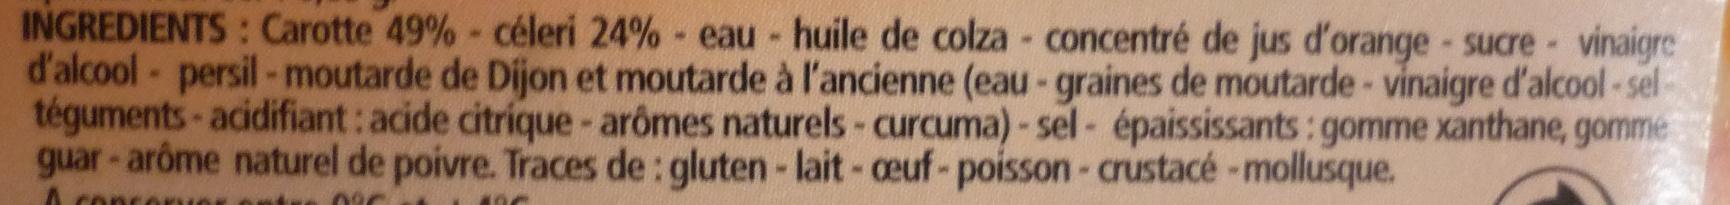 Duo carottes et céleri - Ingrediënten - fr